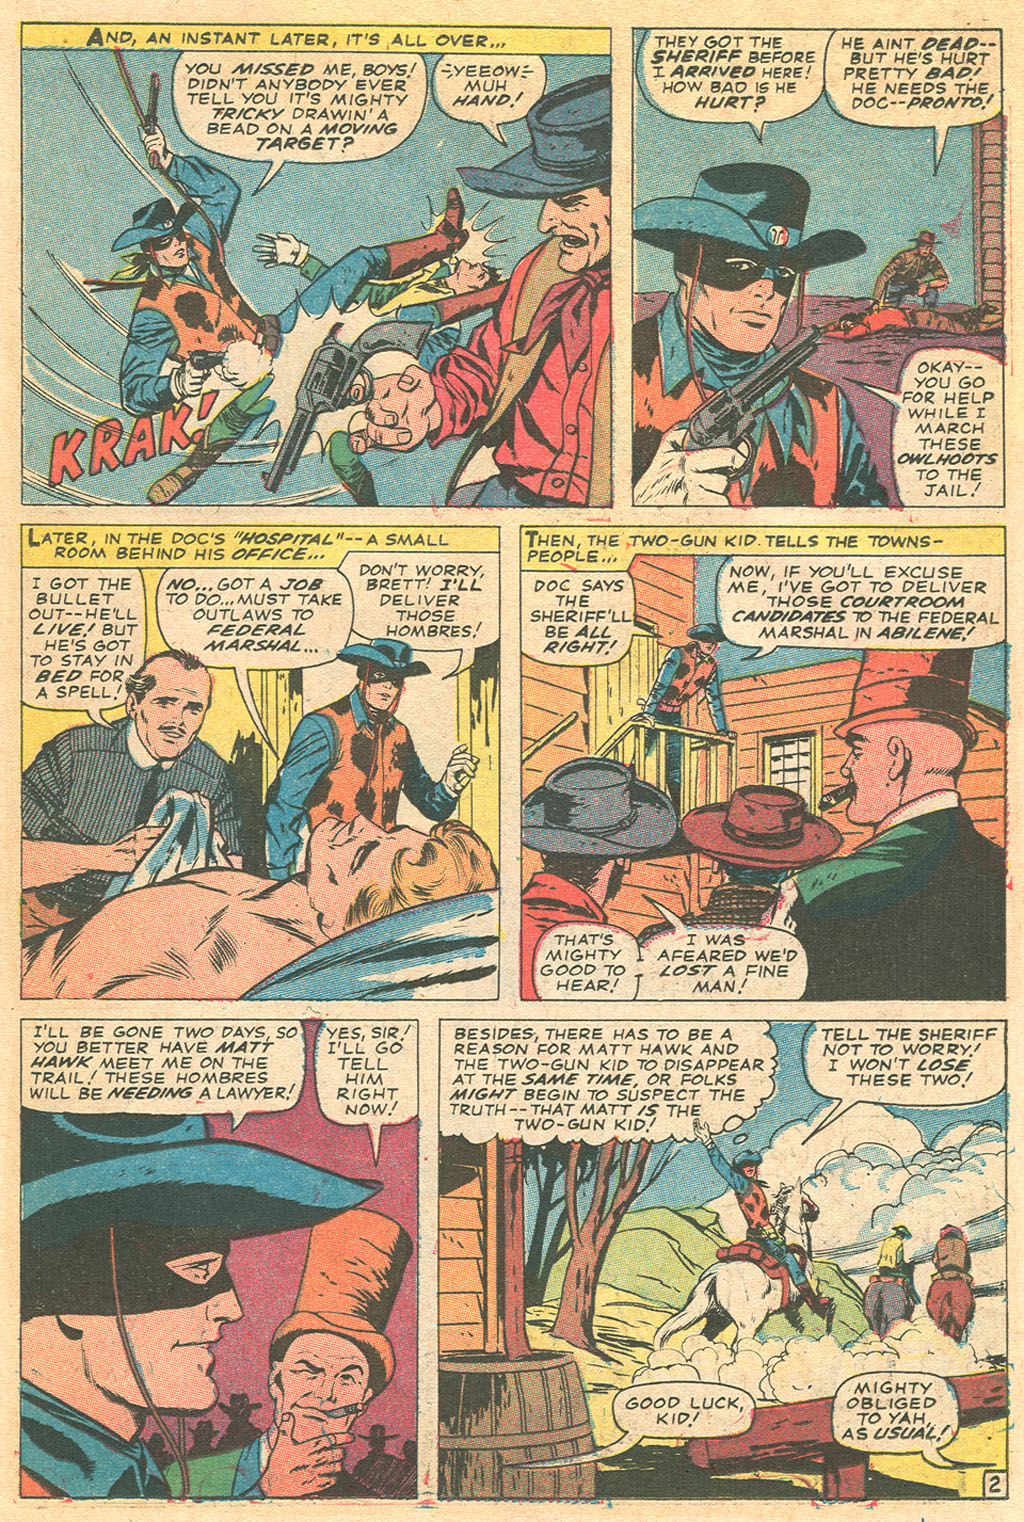 Read online Two-Gun Kid comic -  Issue #86 - 15